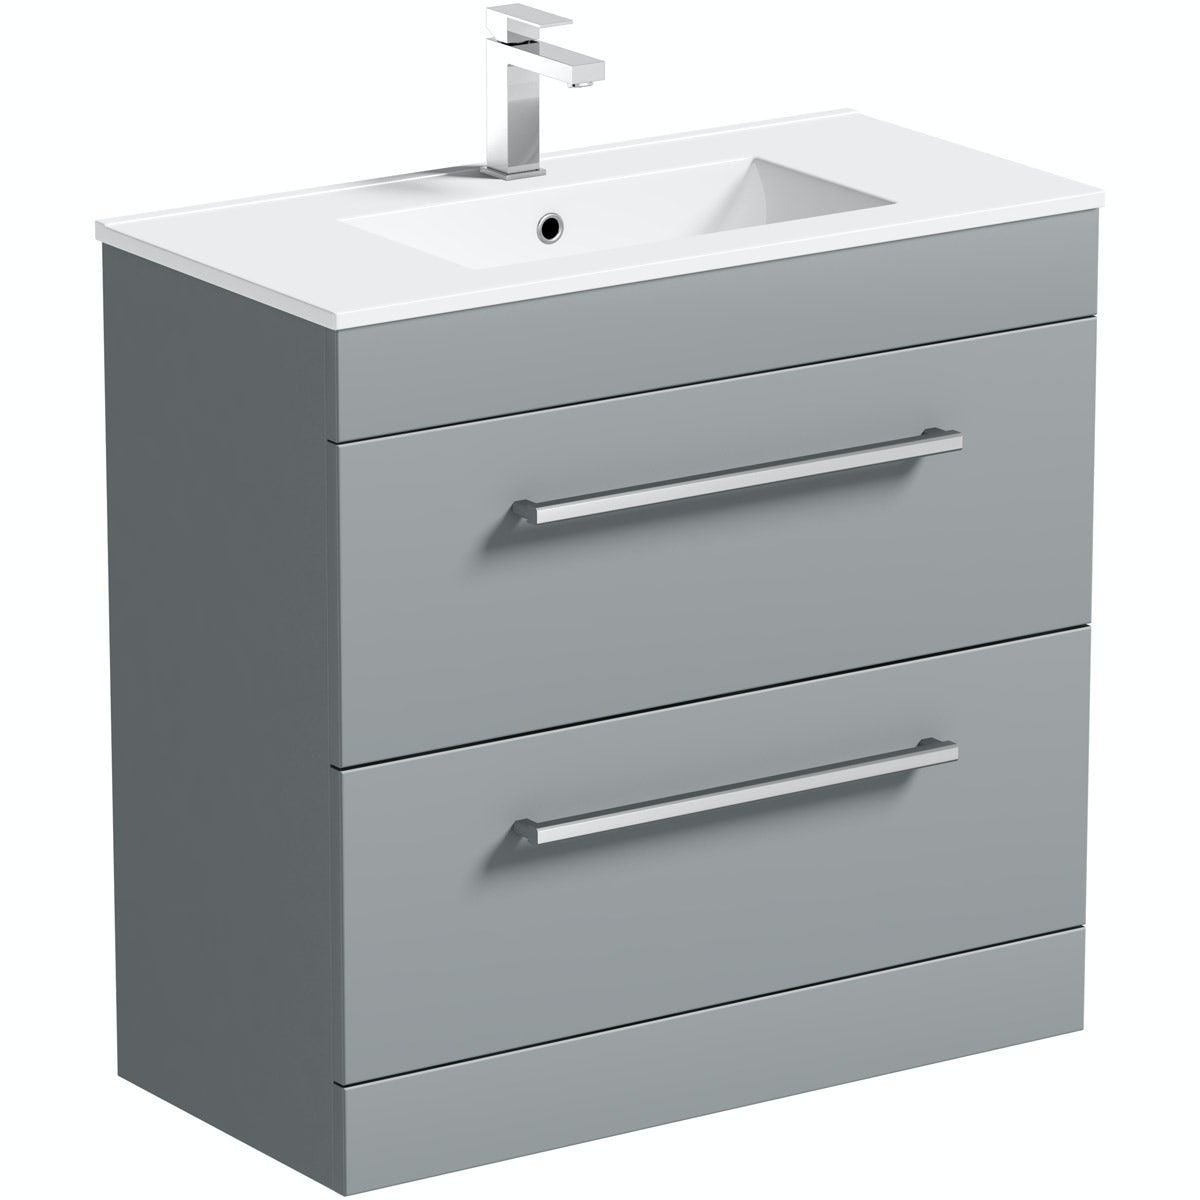 Orchard Derwent stone grey vanity drawer unit and basin 800mm